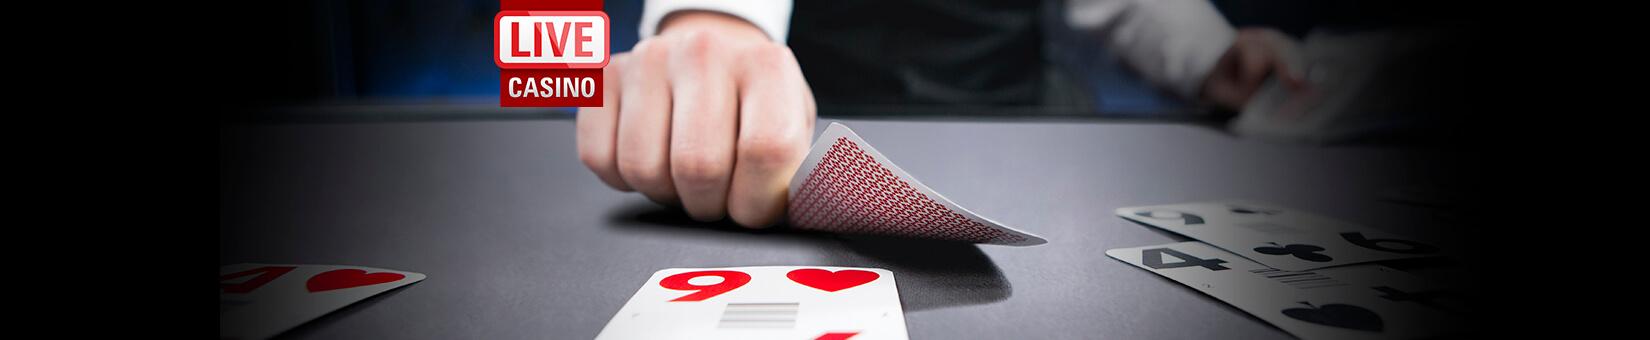 Finnland Casino 670285